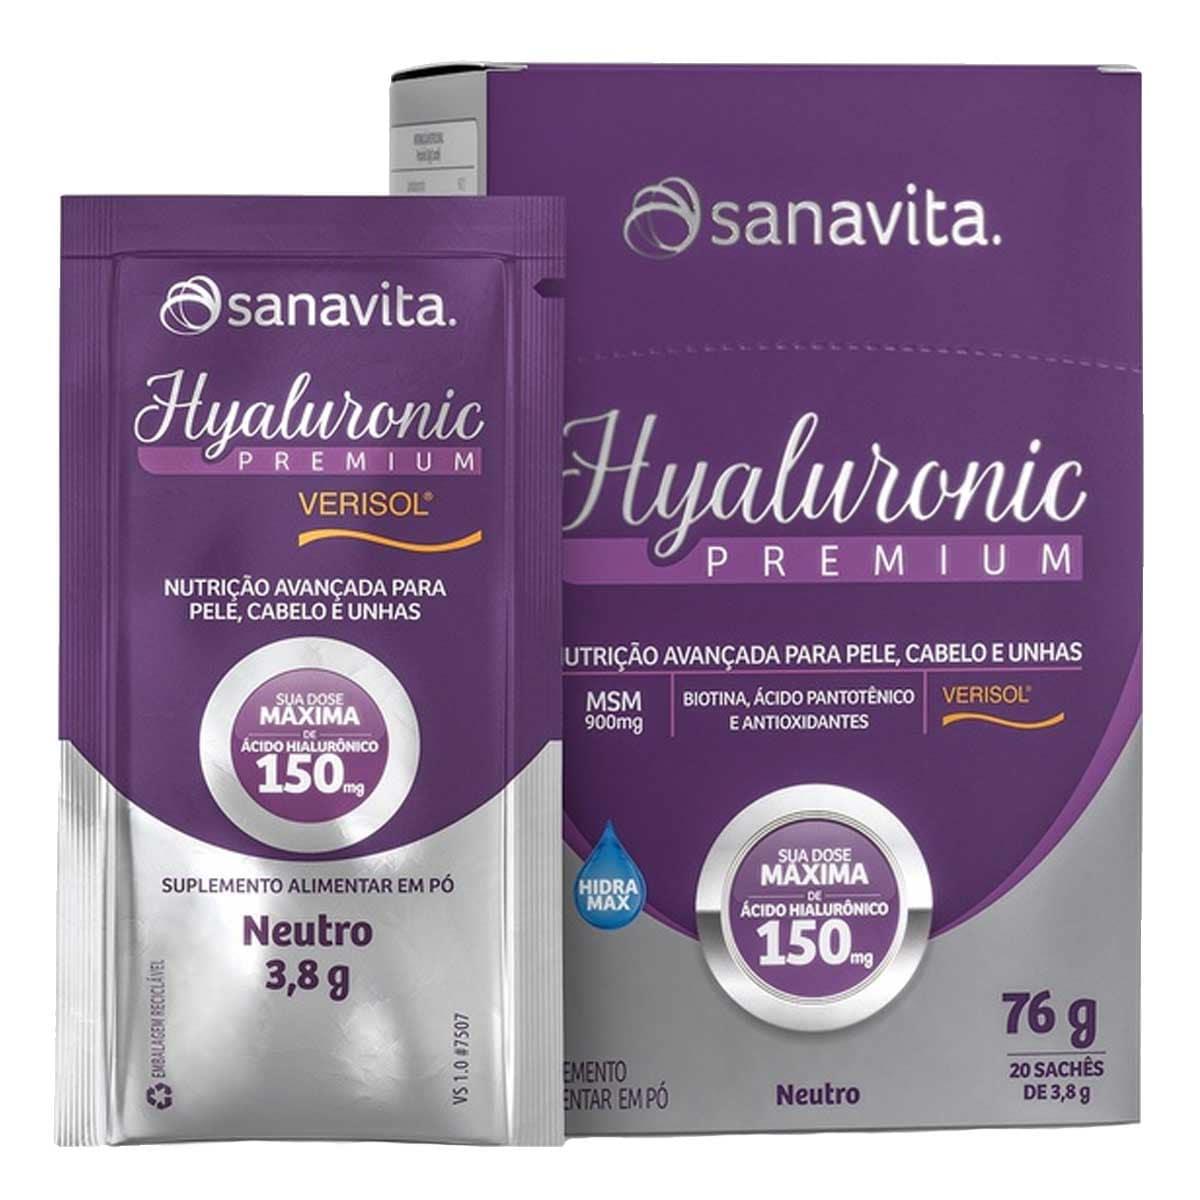 Hyaluronic Verisol Premium 150mg Neutro Display 20 sachês